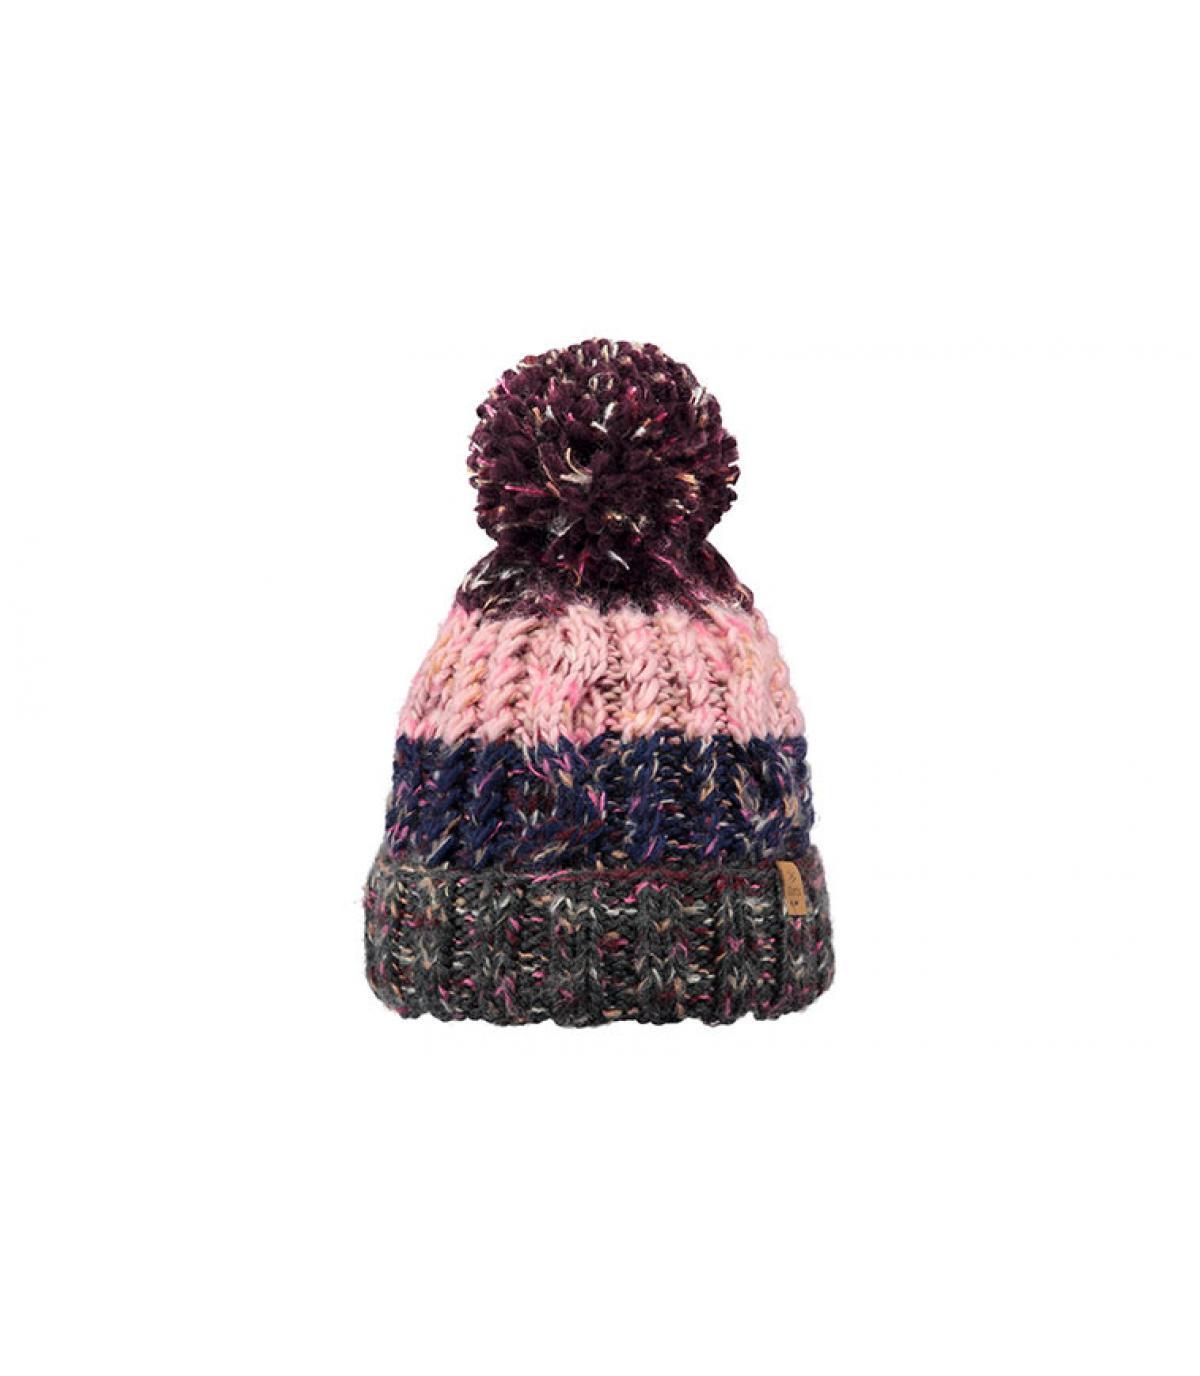 d63d5ab3 kwast hoed strepen roze grijs - Sandy Beanie dark heather van Barts ...